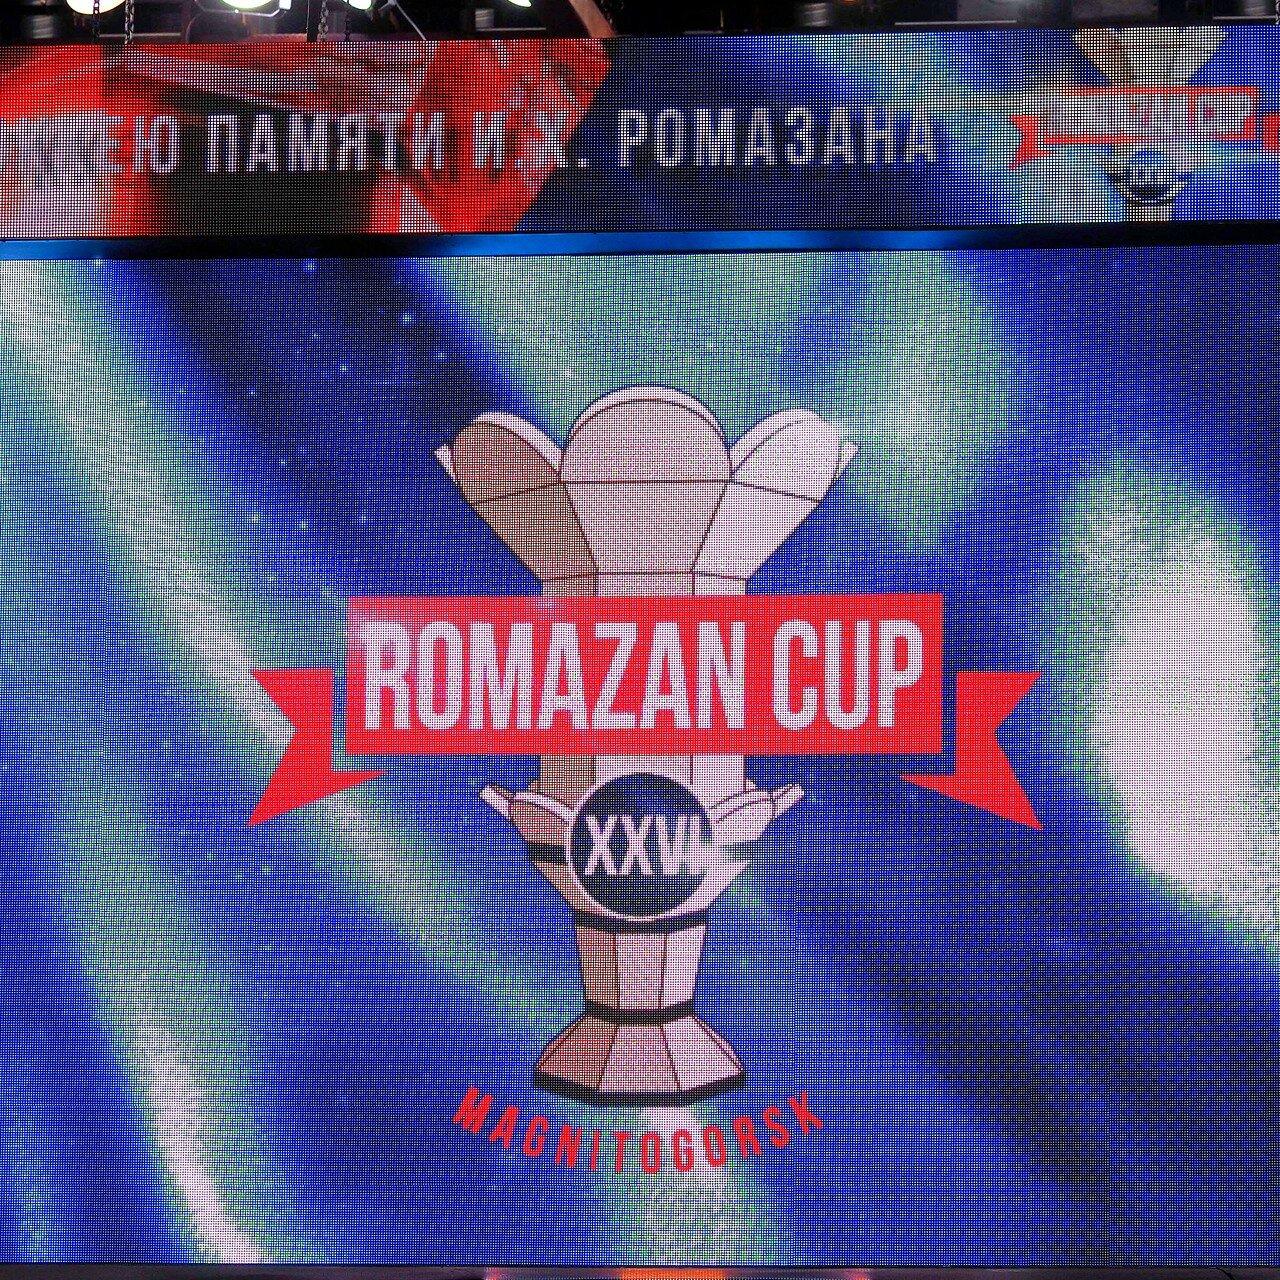 Мемориал Ромазана 2017. Трактор - Сибирь 12.08.2017